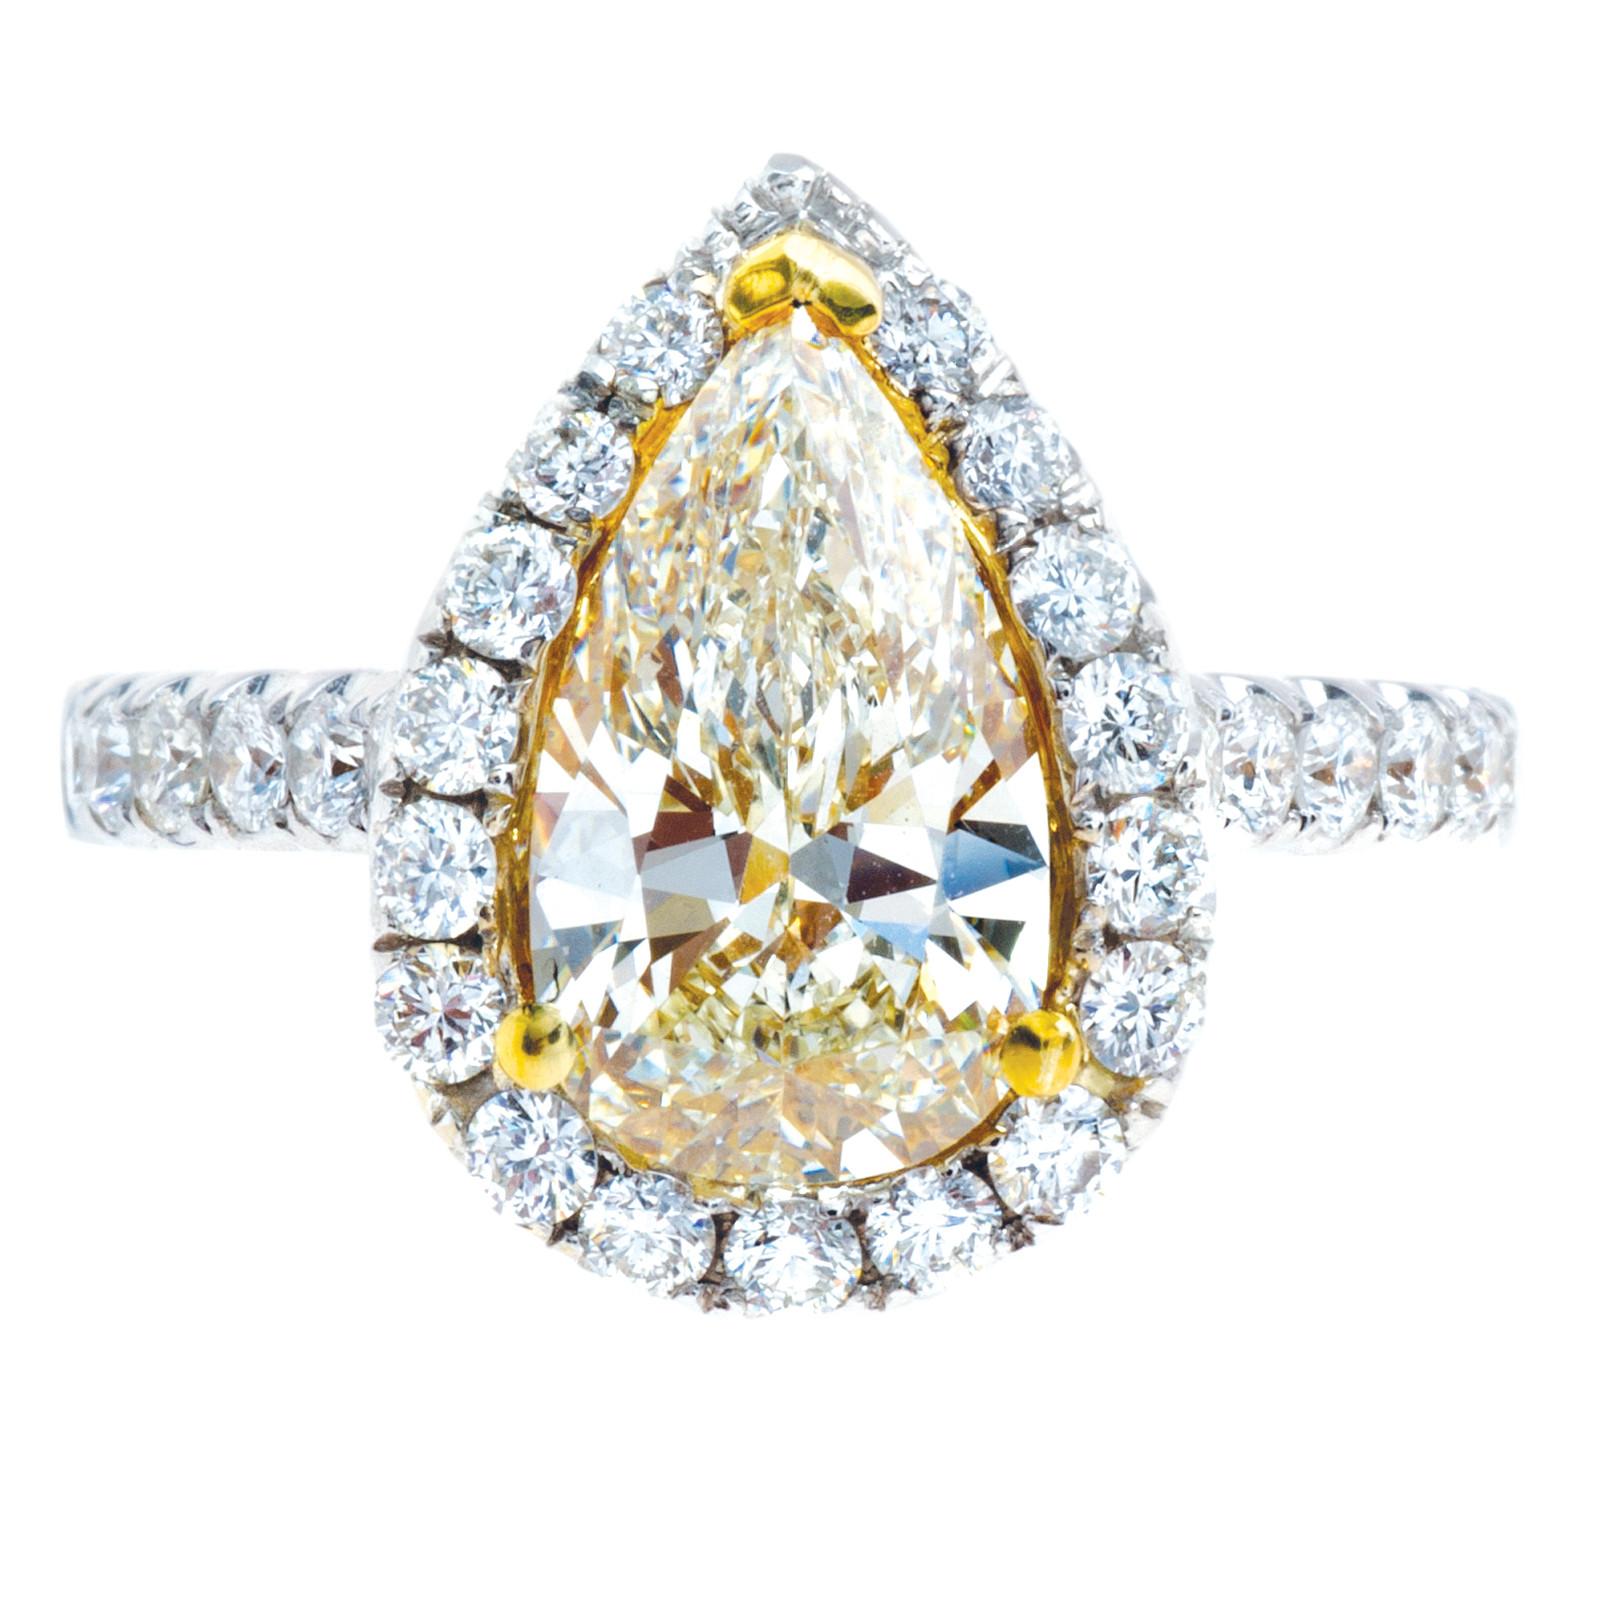 New 3.10 CTW Fancy Yellow & White Diamond Ring